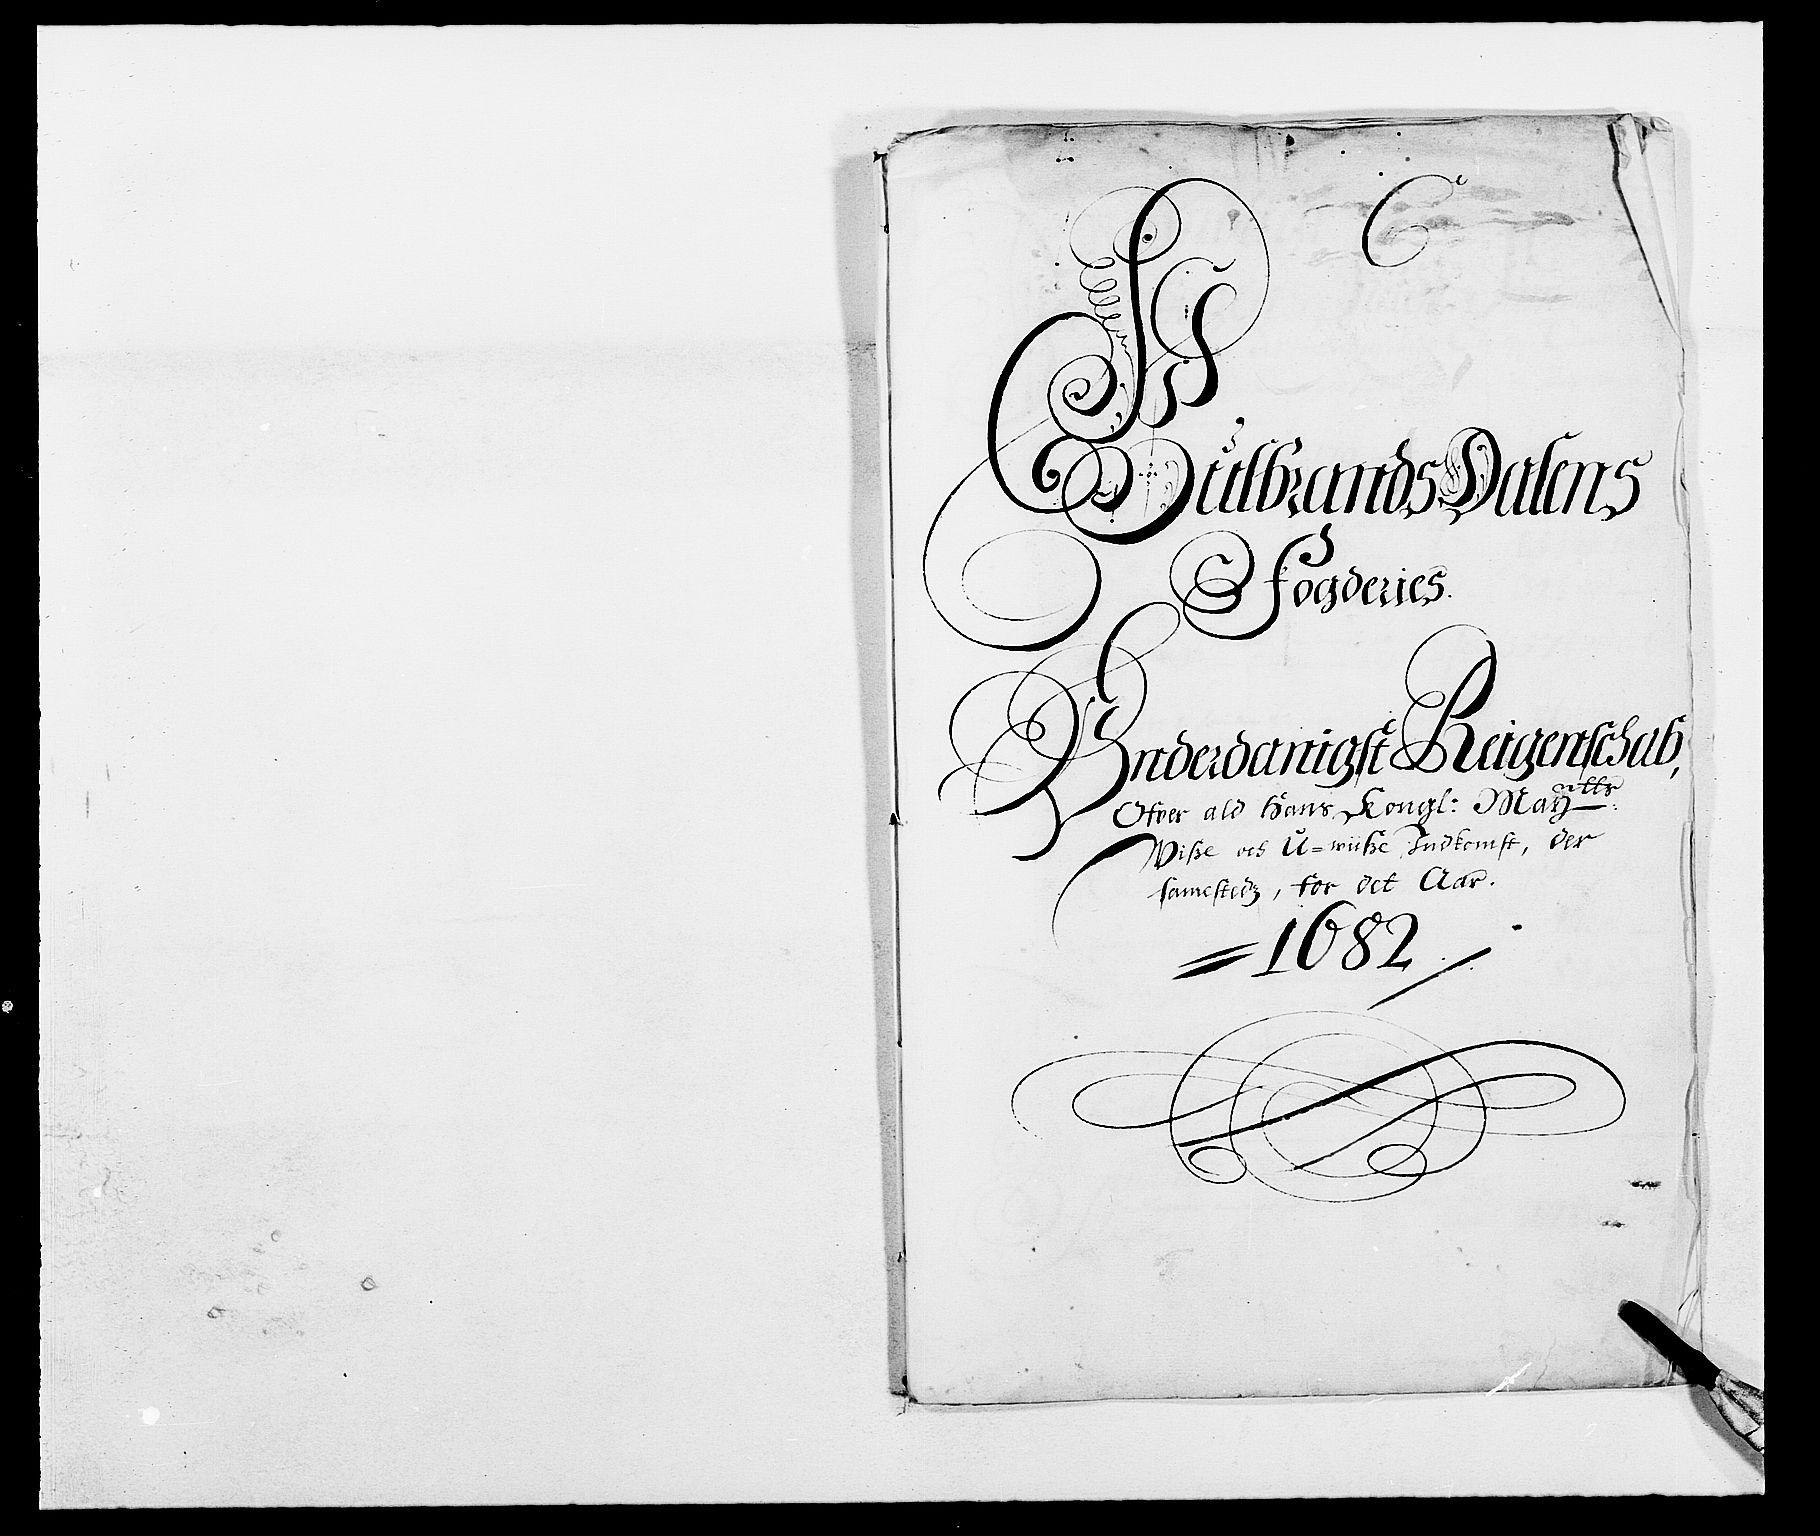 RA, Rentekammeret inntil 1814, Reviderte regnskaper, Fogderegnskap, R17/L1157: Fogderegnskap Gudbrandsdal, 1682-1689, s. 44